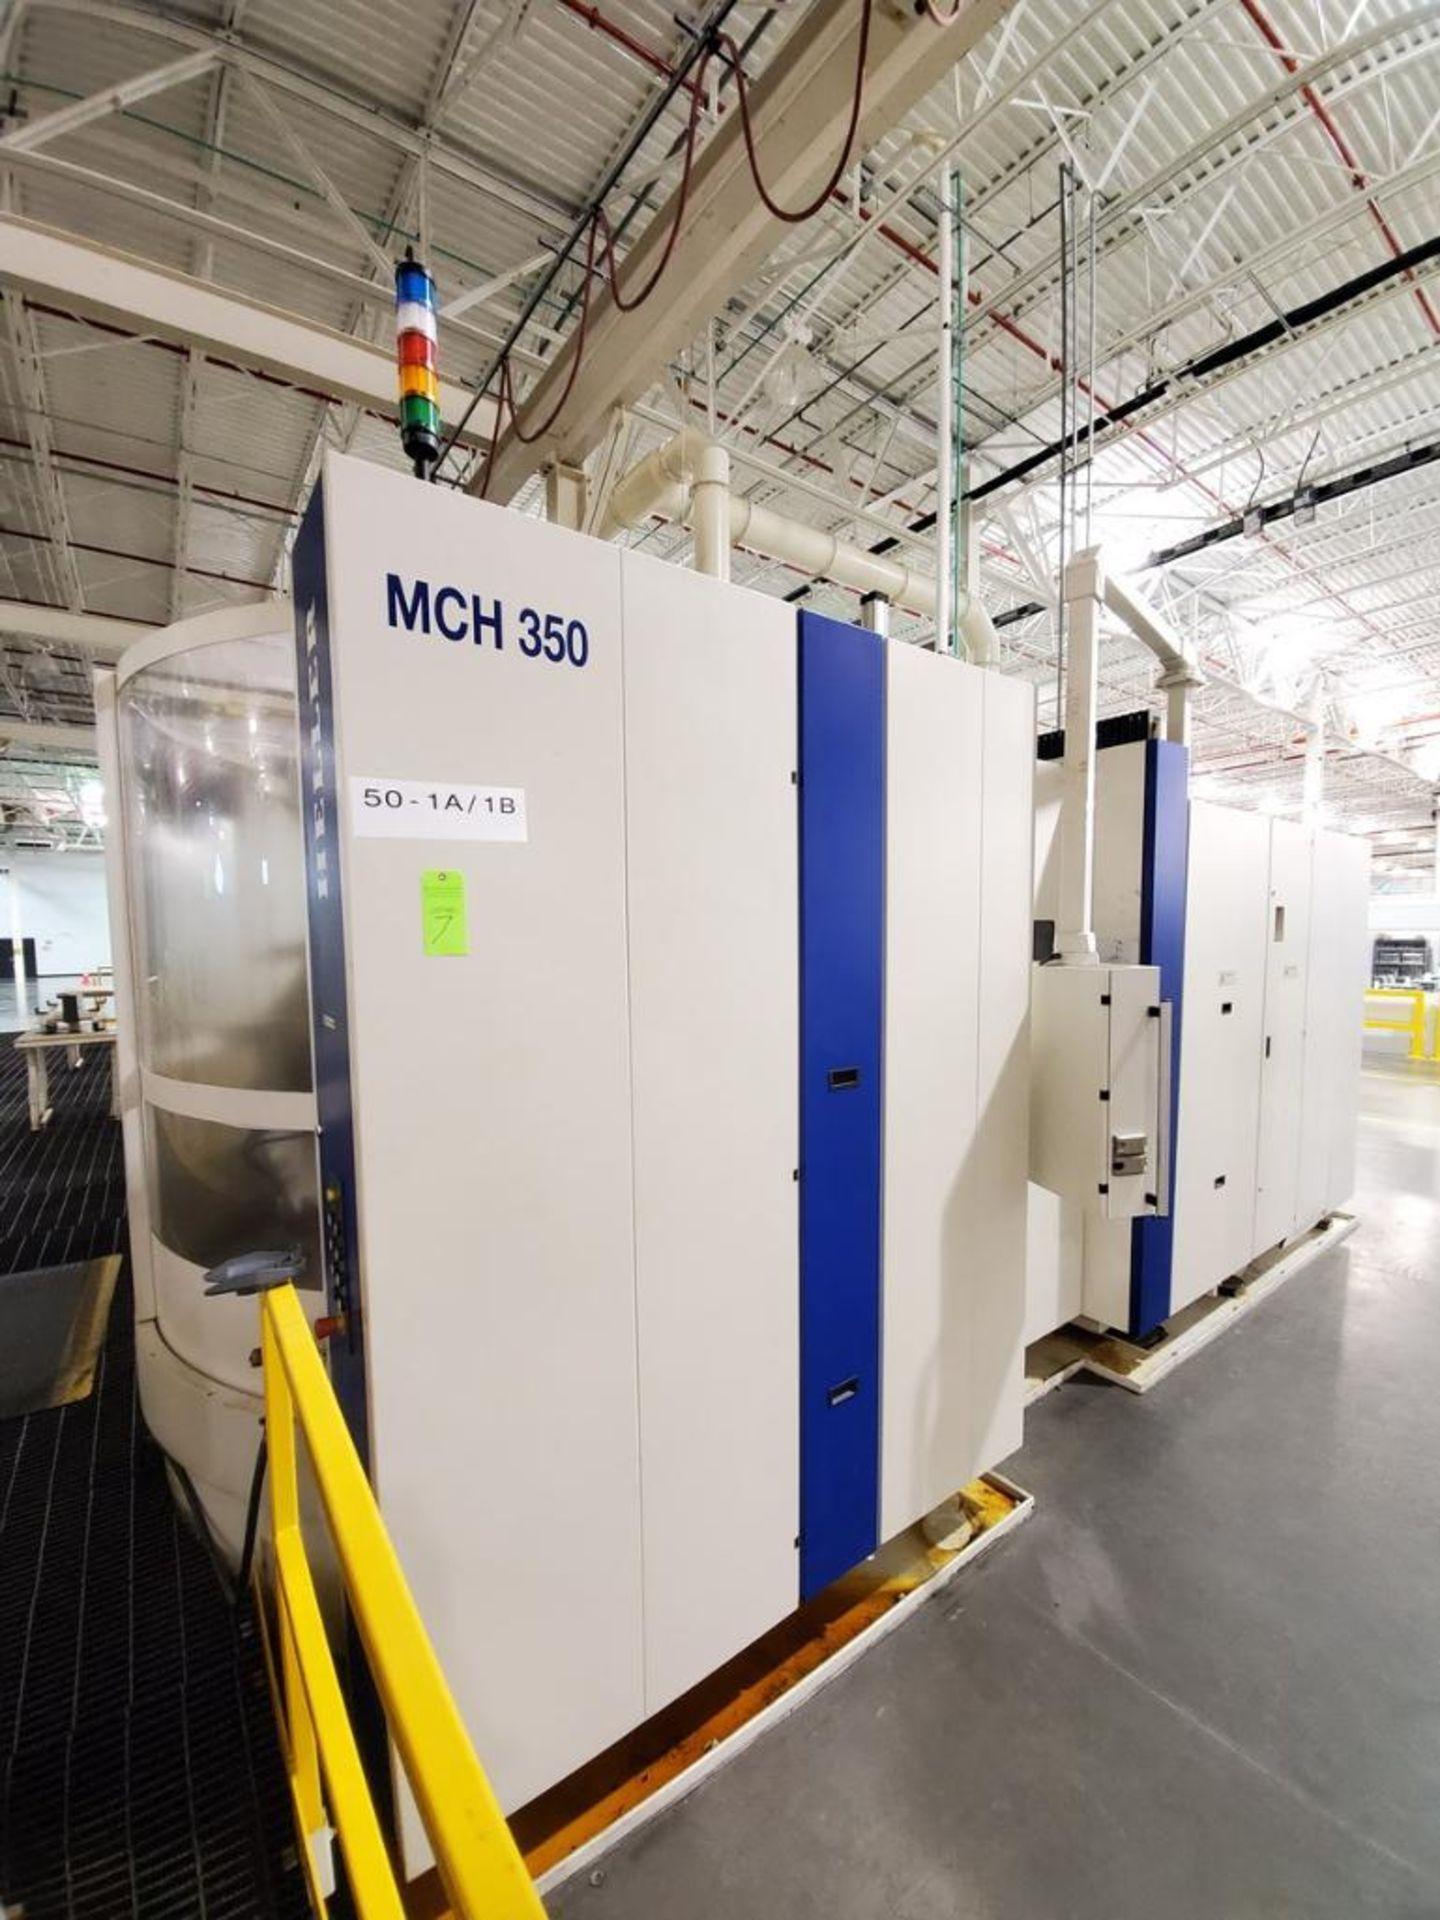 Lot 7 - 2011 Heller MCH 350 PC, Horizontal Machining Center